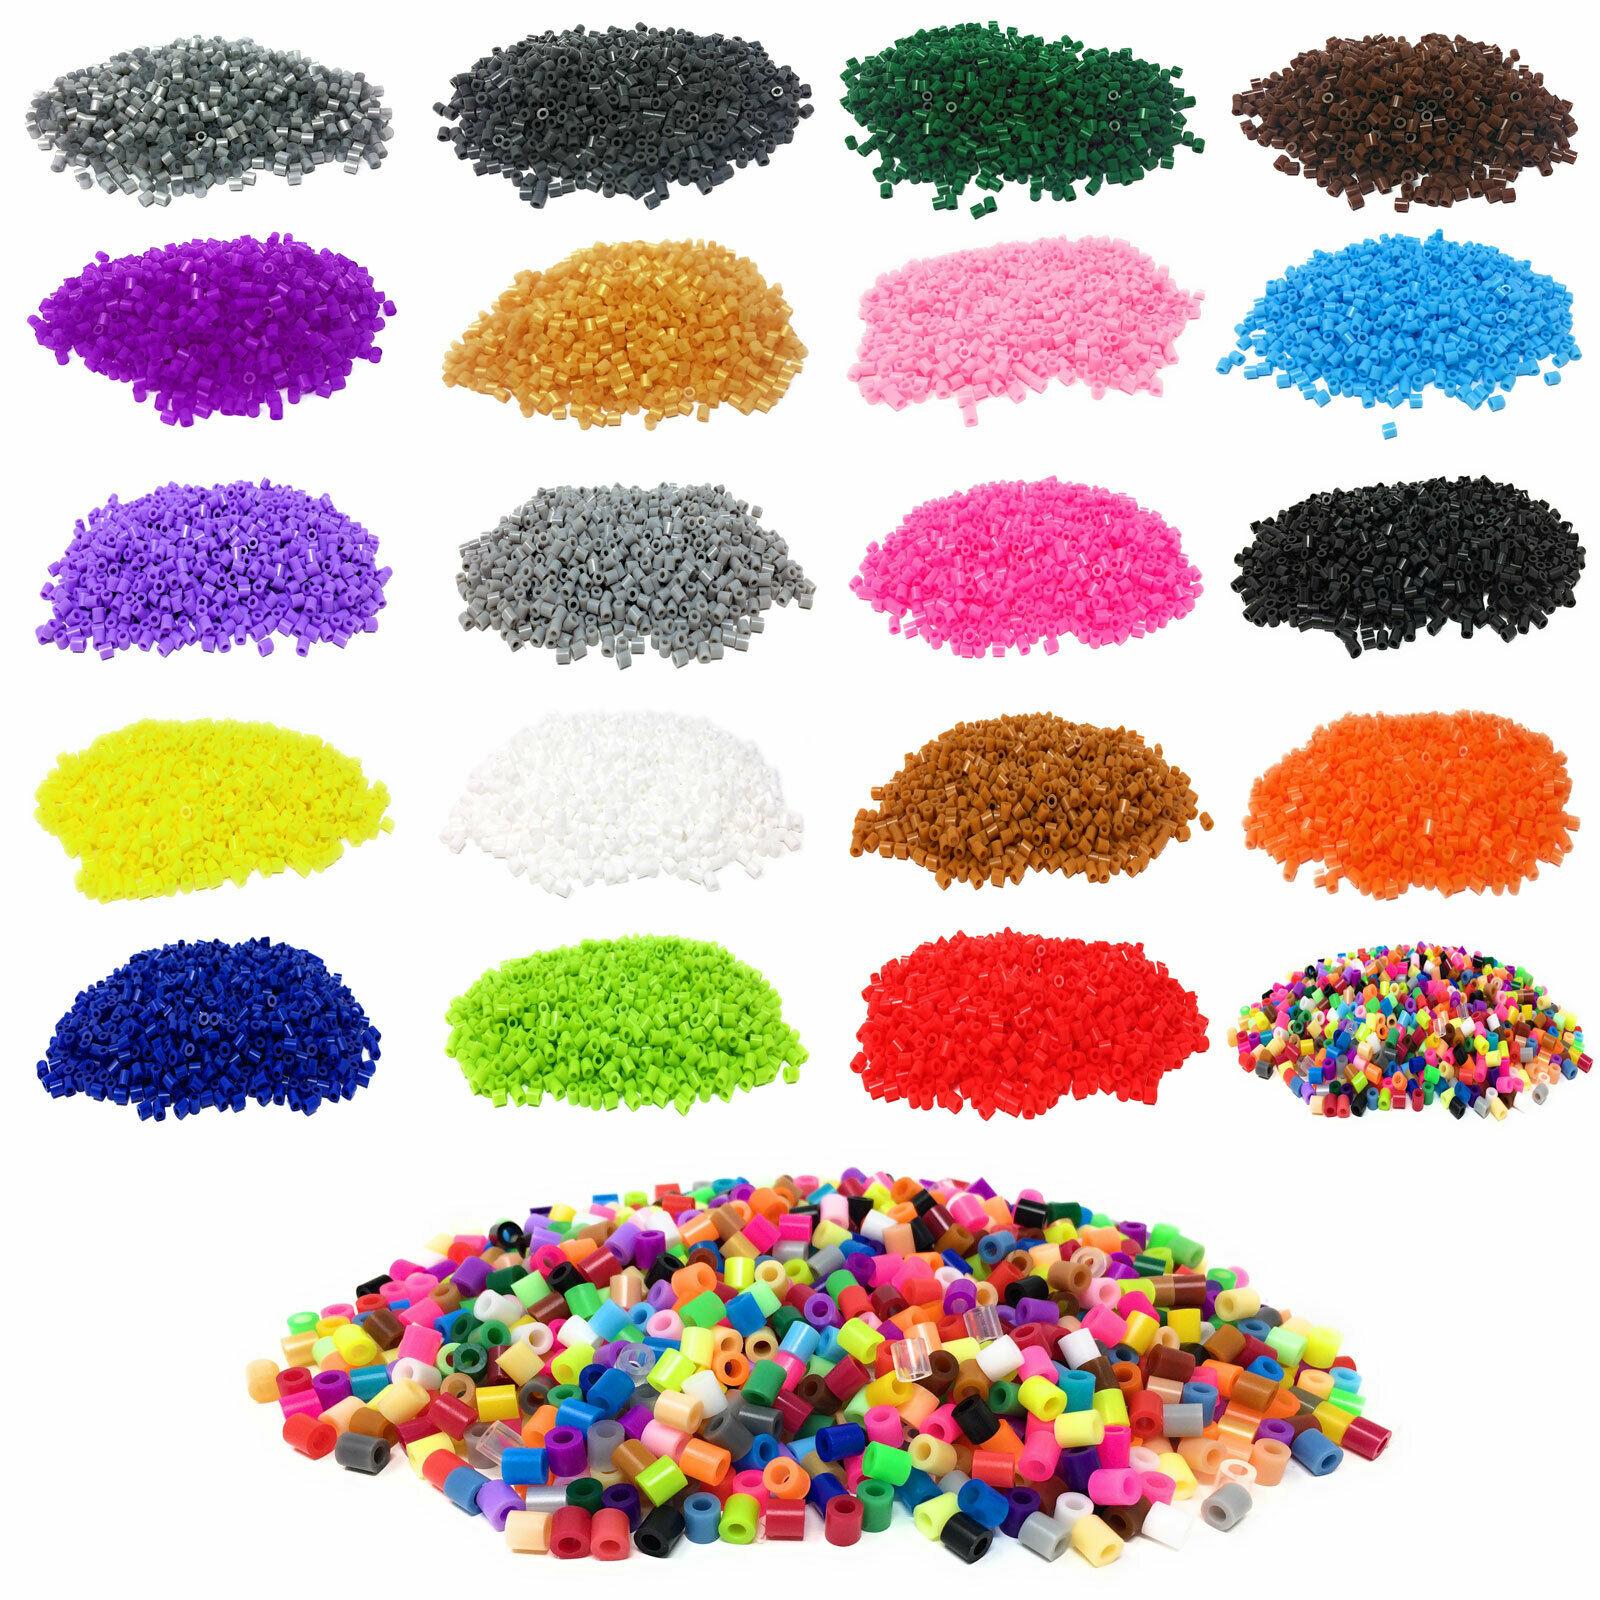 Fuse Beads 1000 Pack Hama Beads 5mm Midi Work Like Hama Bead Mixed Iron Kids Arts & Crafts Educational Toys